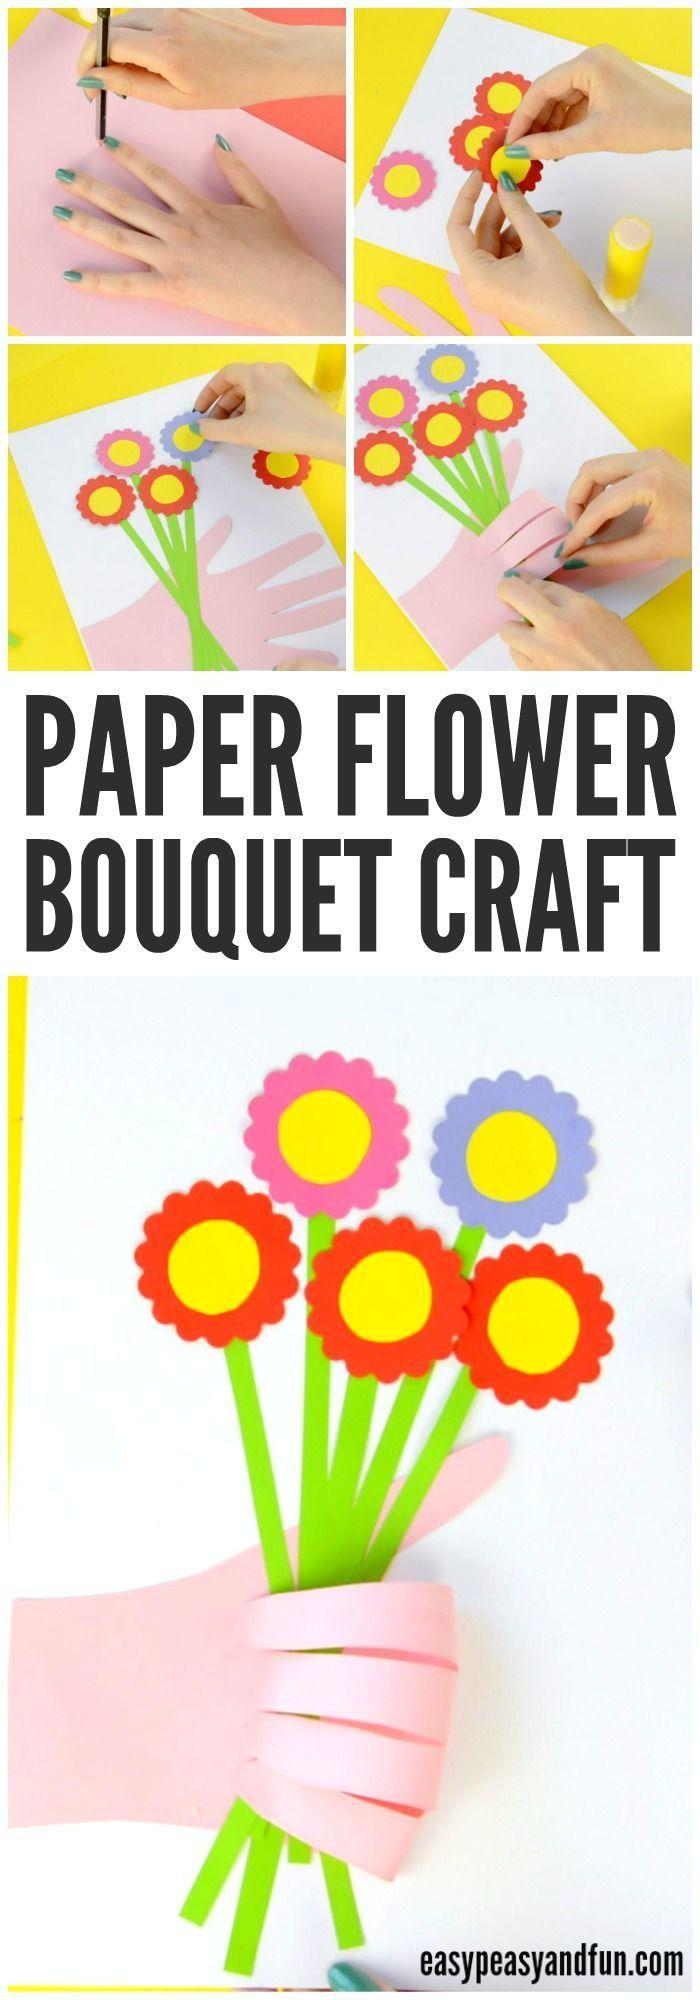 Adorable Handprint Flower Craft for Kids to Make